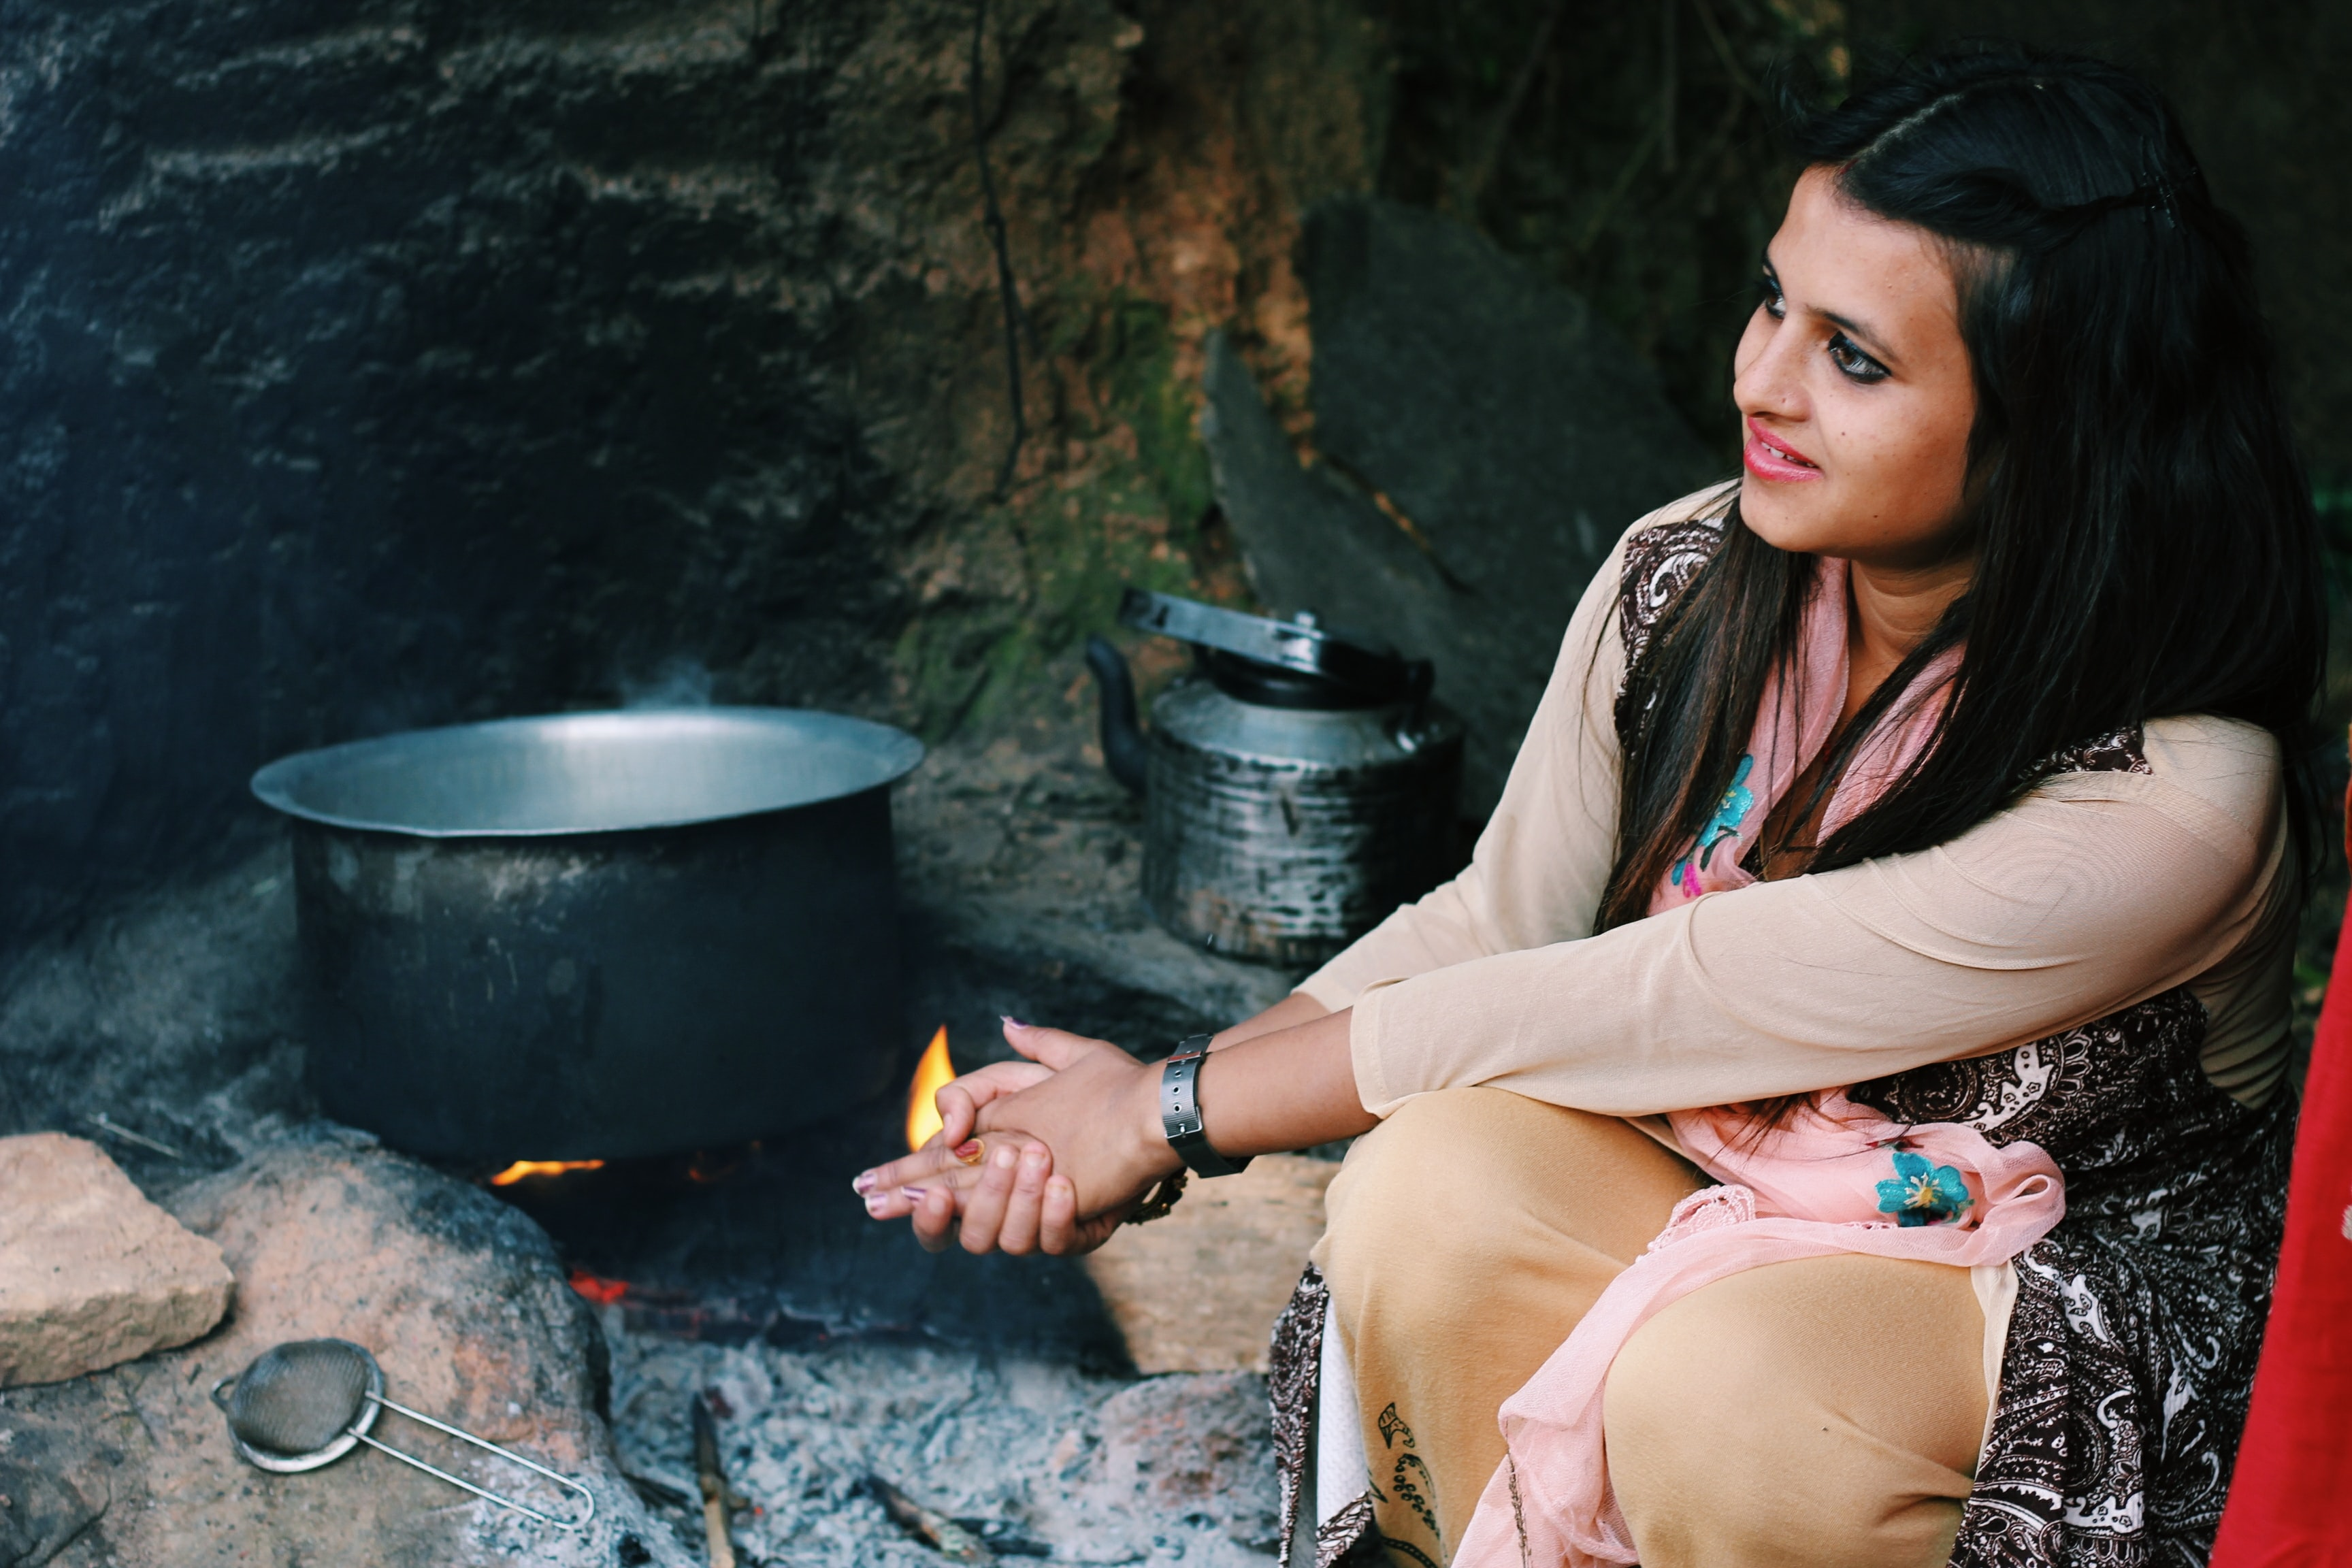 woman sitting near cook pot